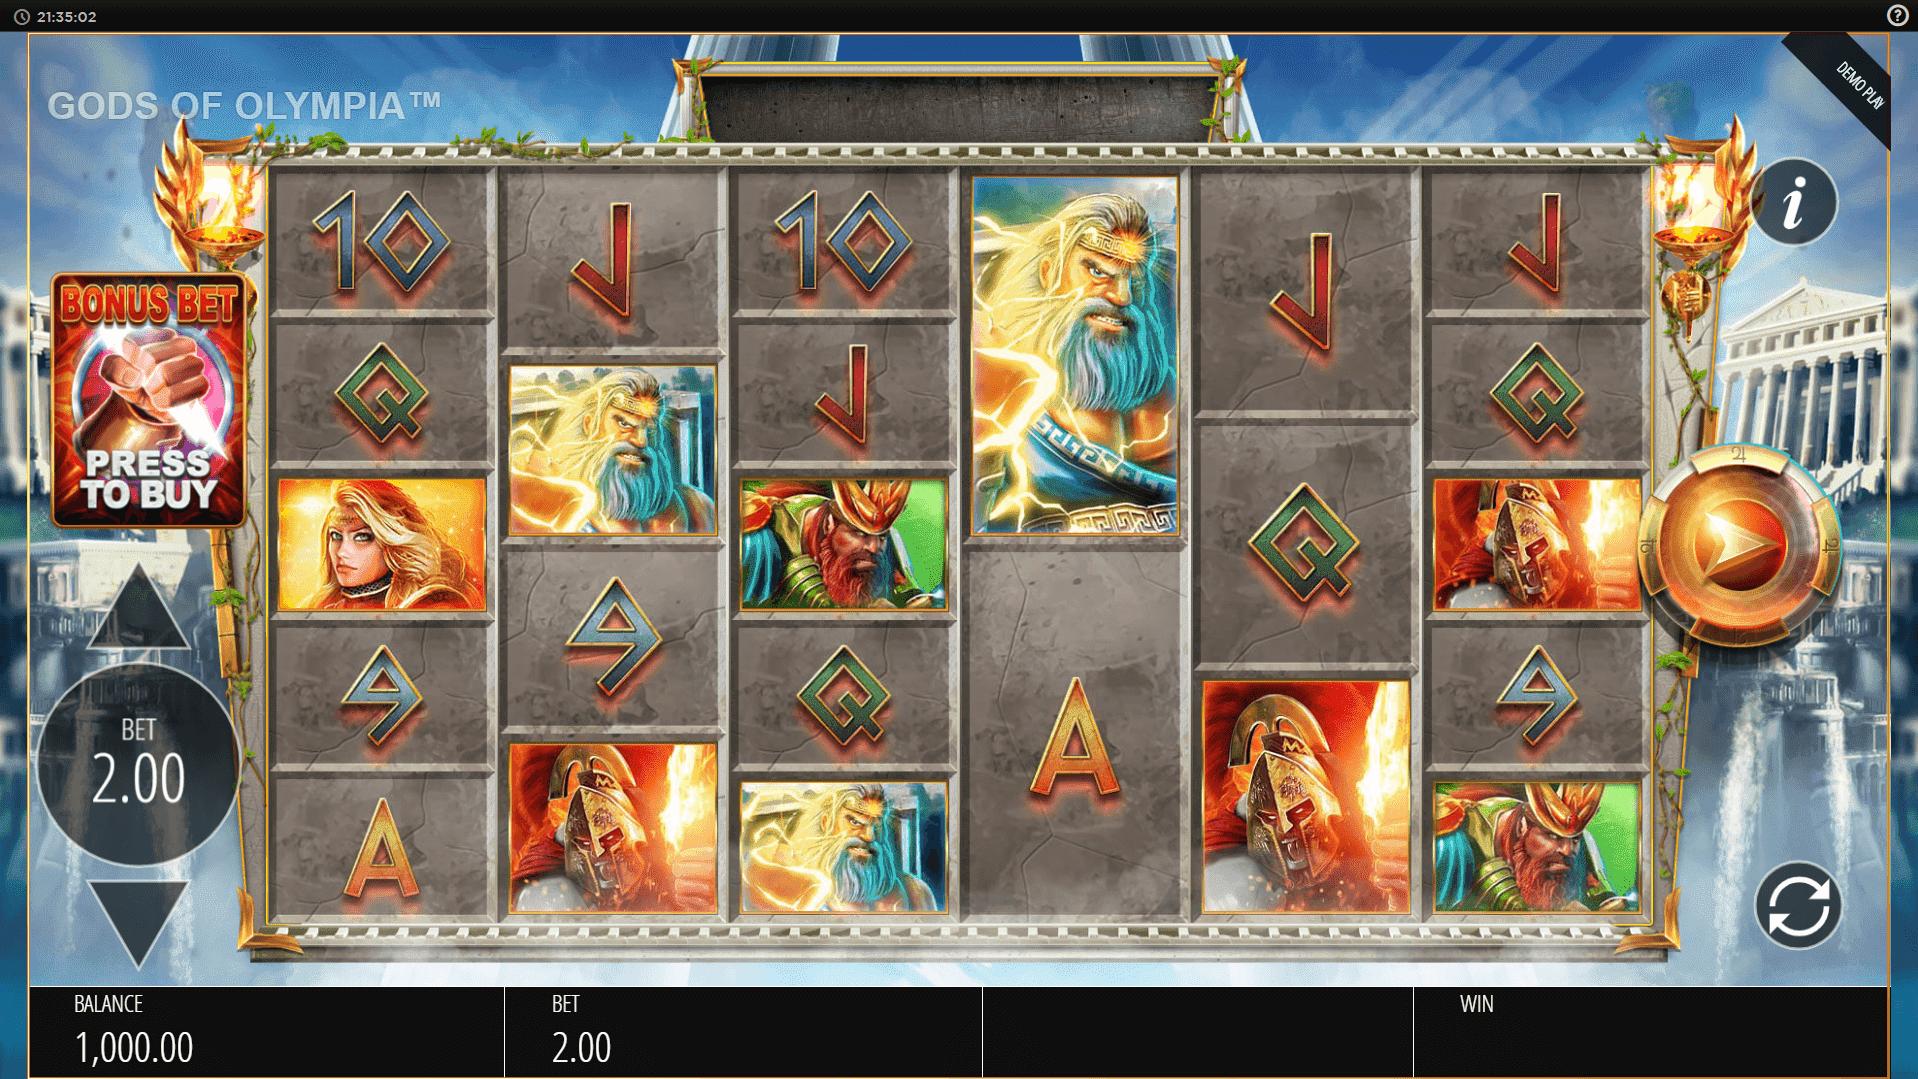 Gods of Olympus Megaways slot machine screenshot